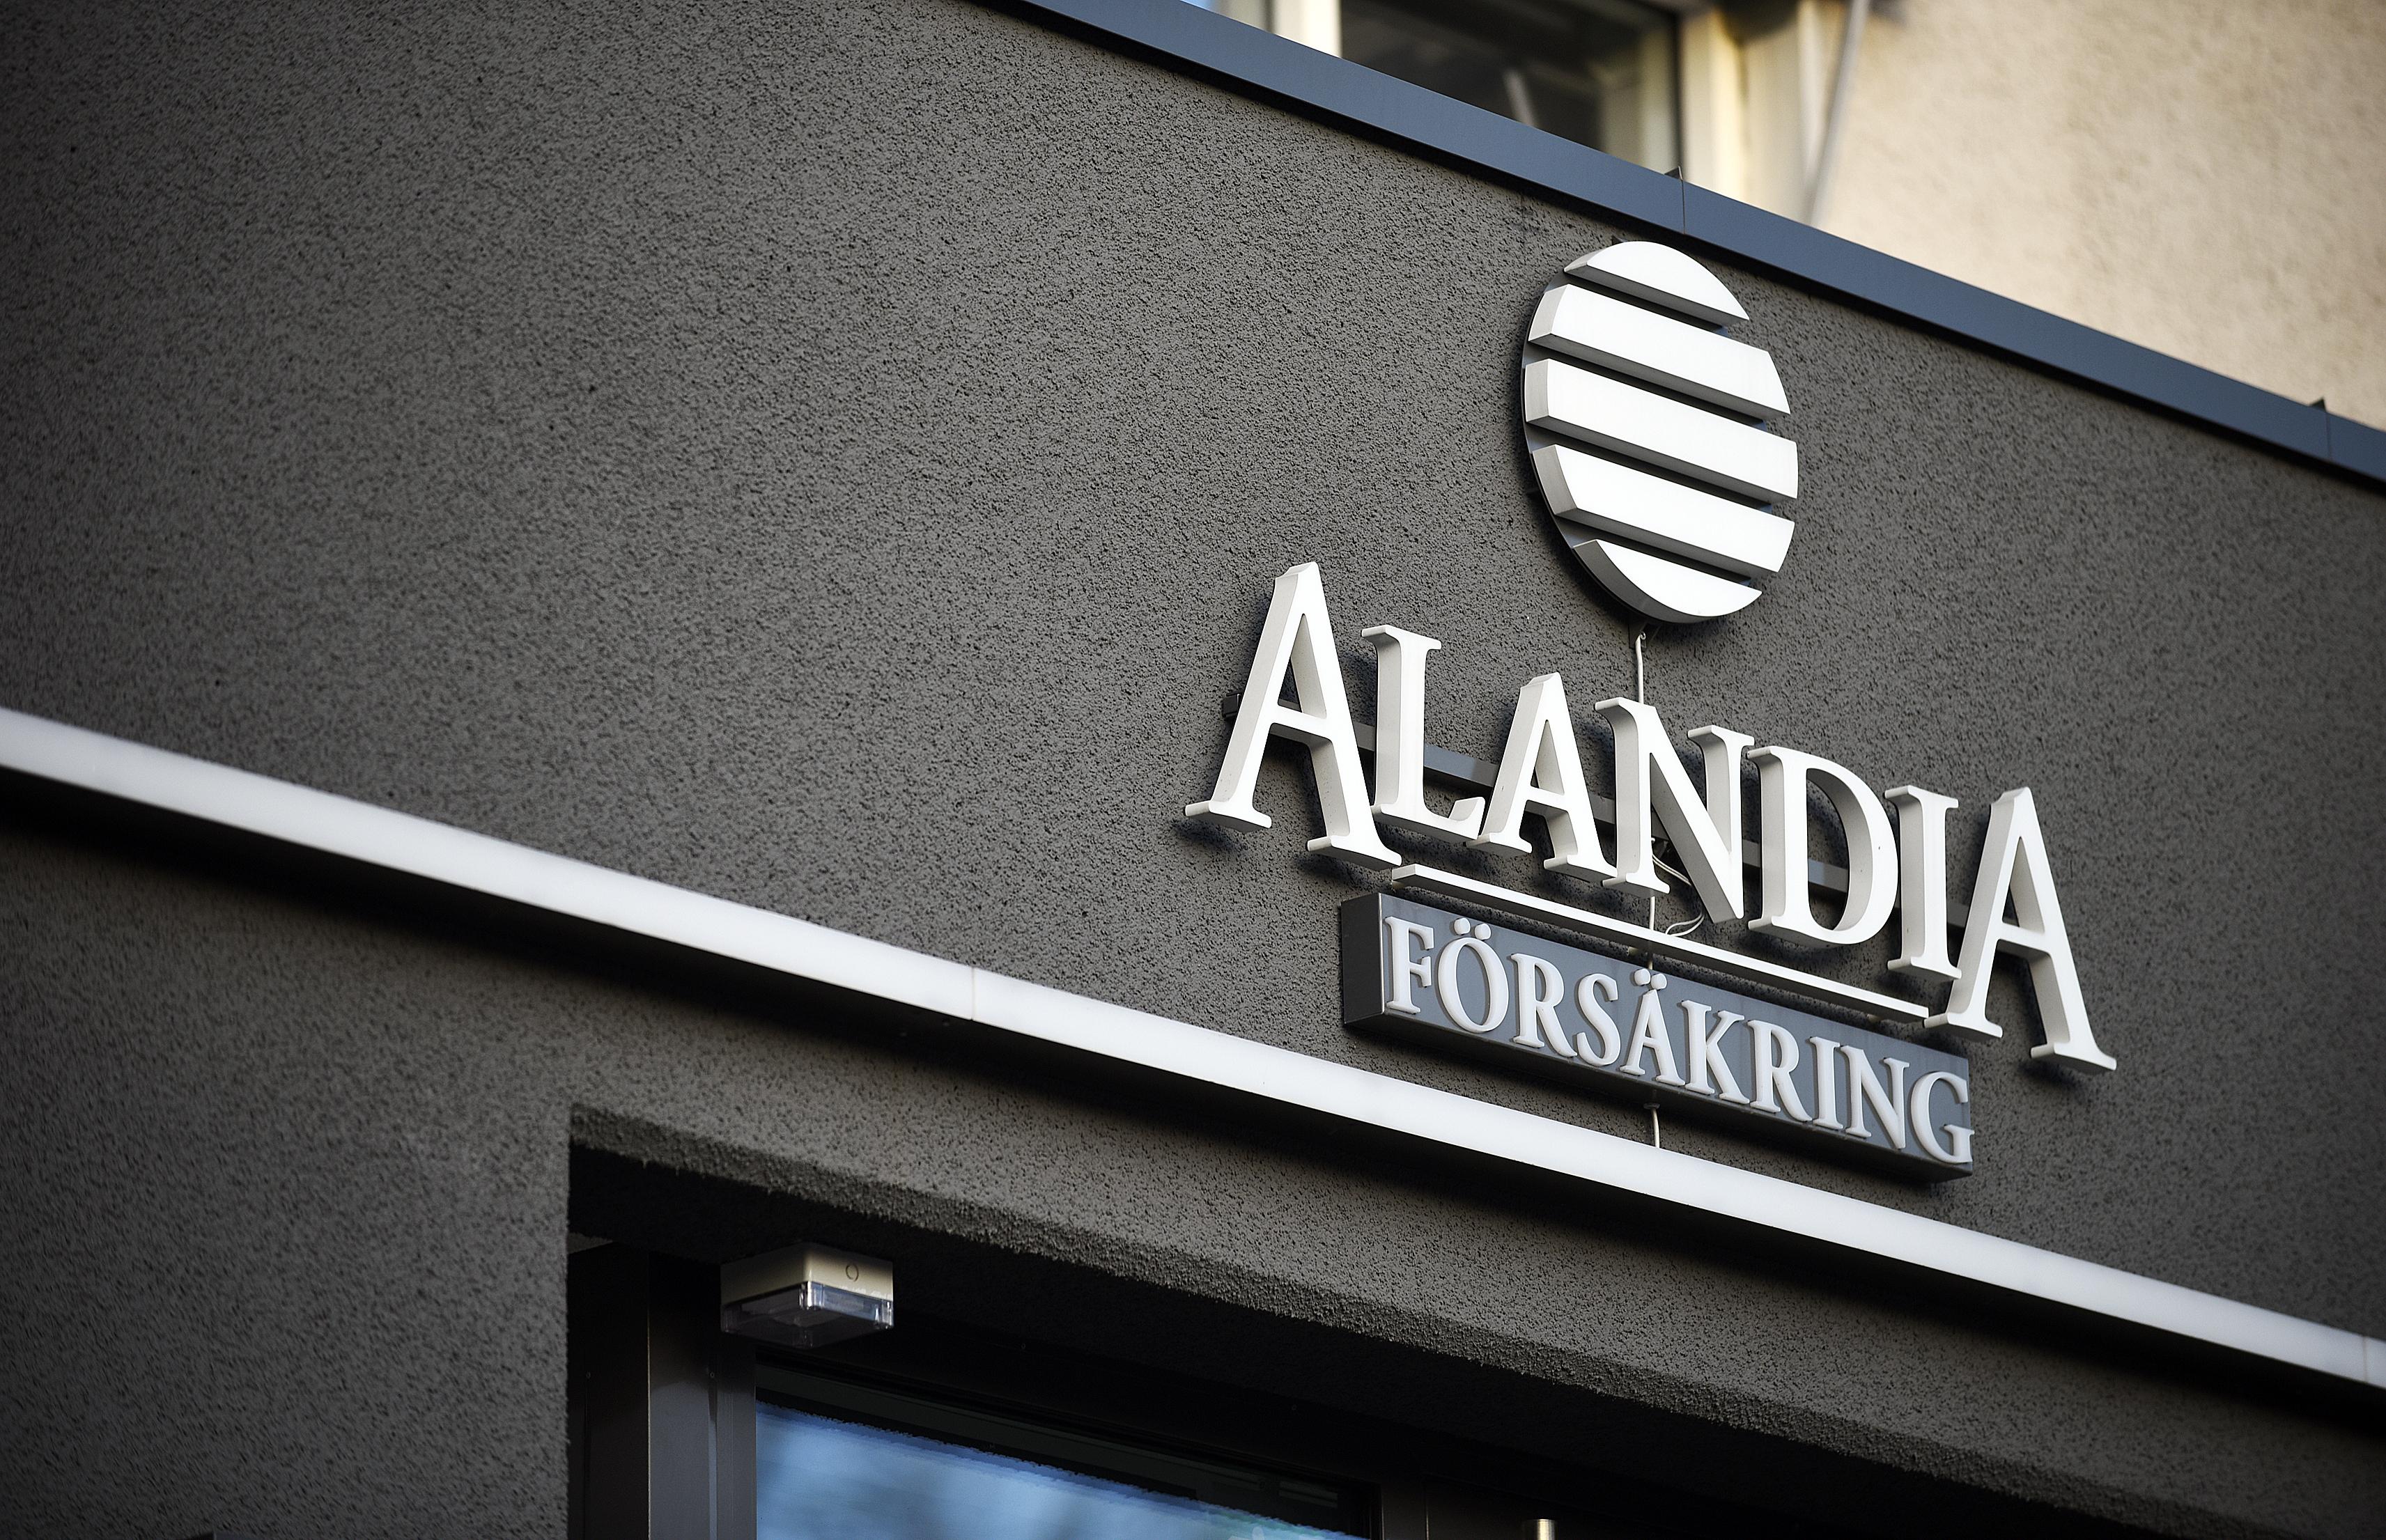 © Nya Åland